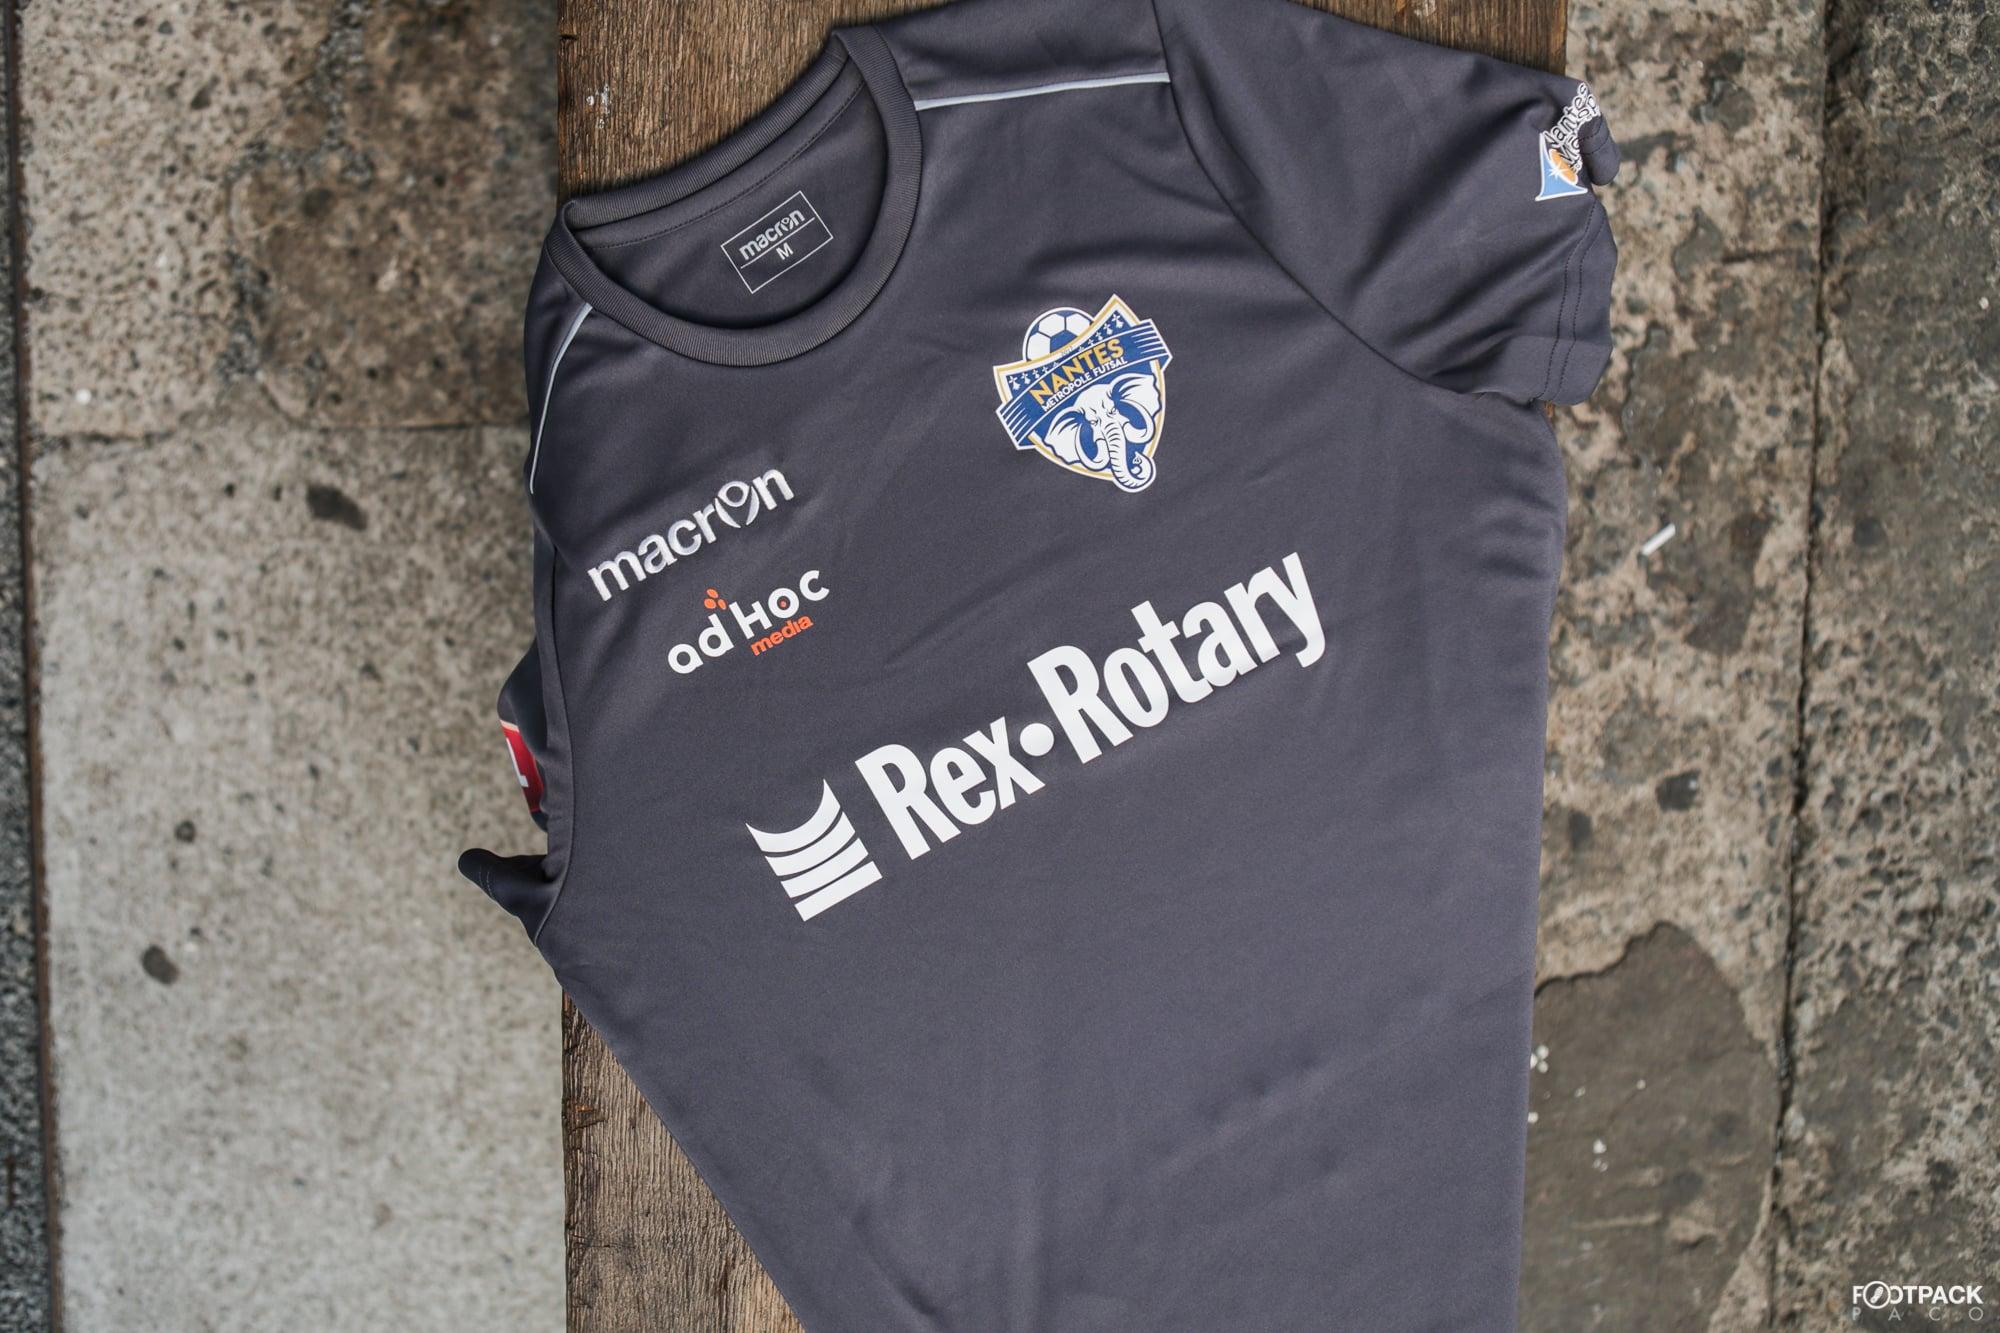 maillot-gardien-3-nantes-metropole-futsal-2018-2019-macron-footpack-details